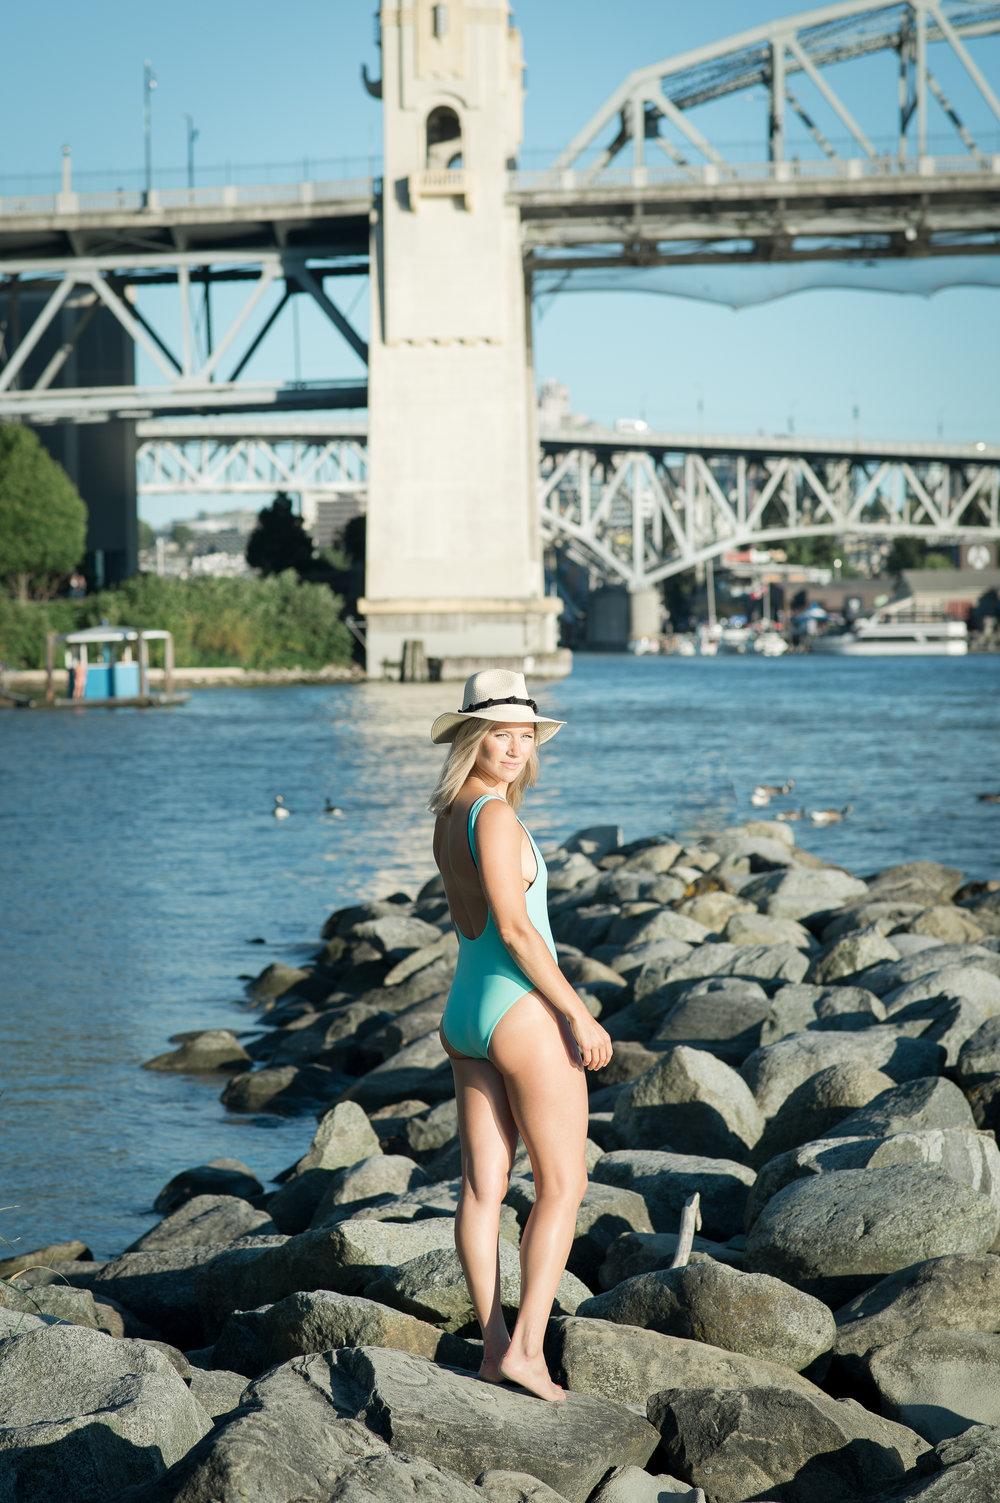 071118_UnionSwimwear-33 copy.jpg